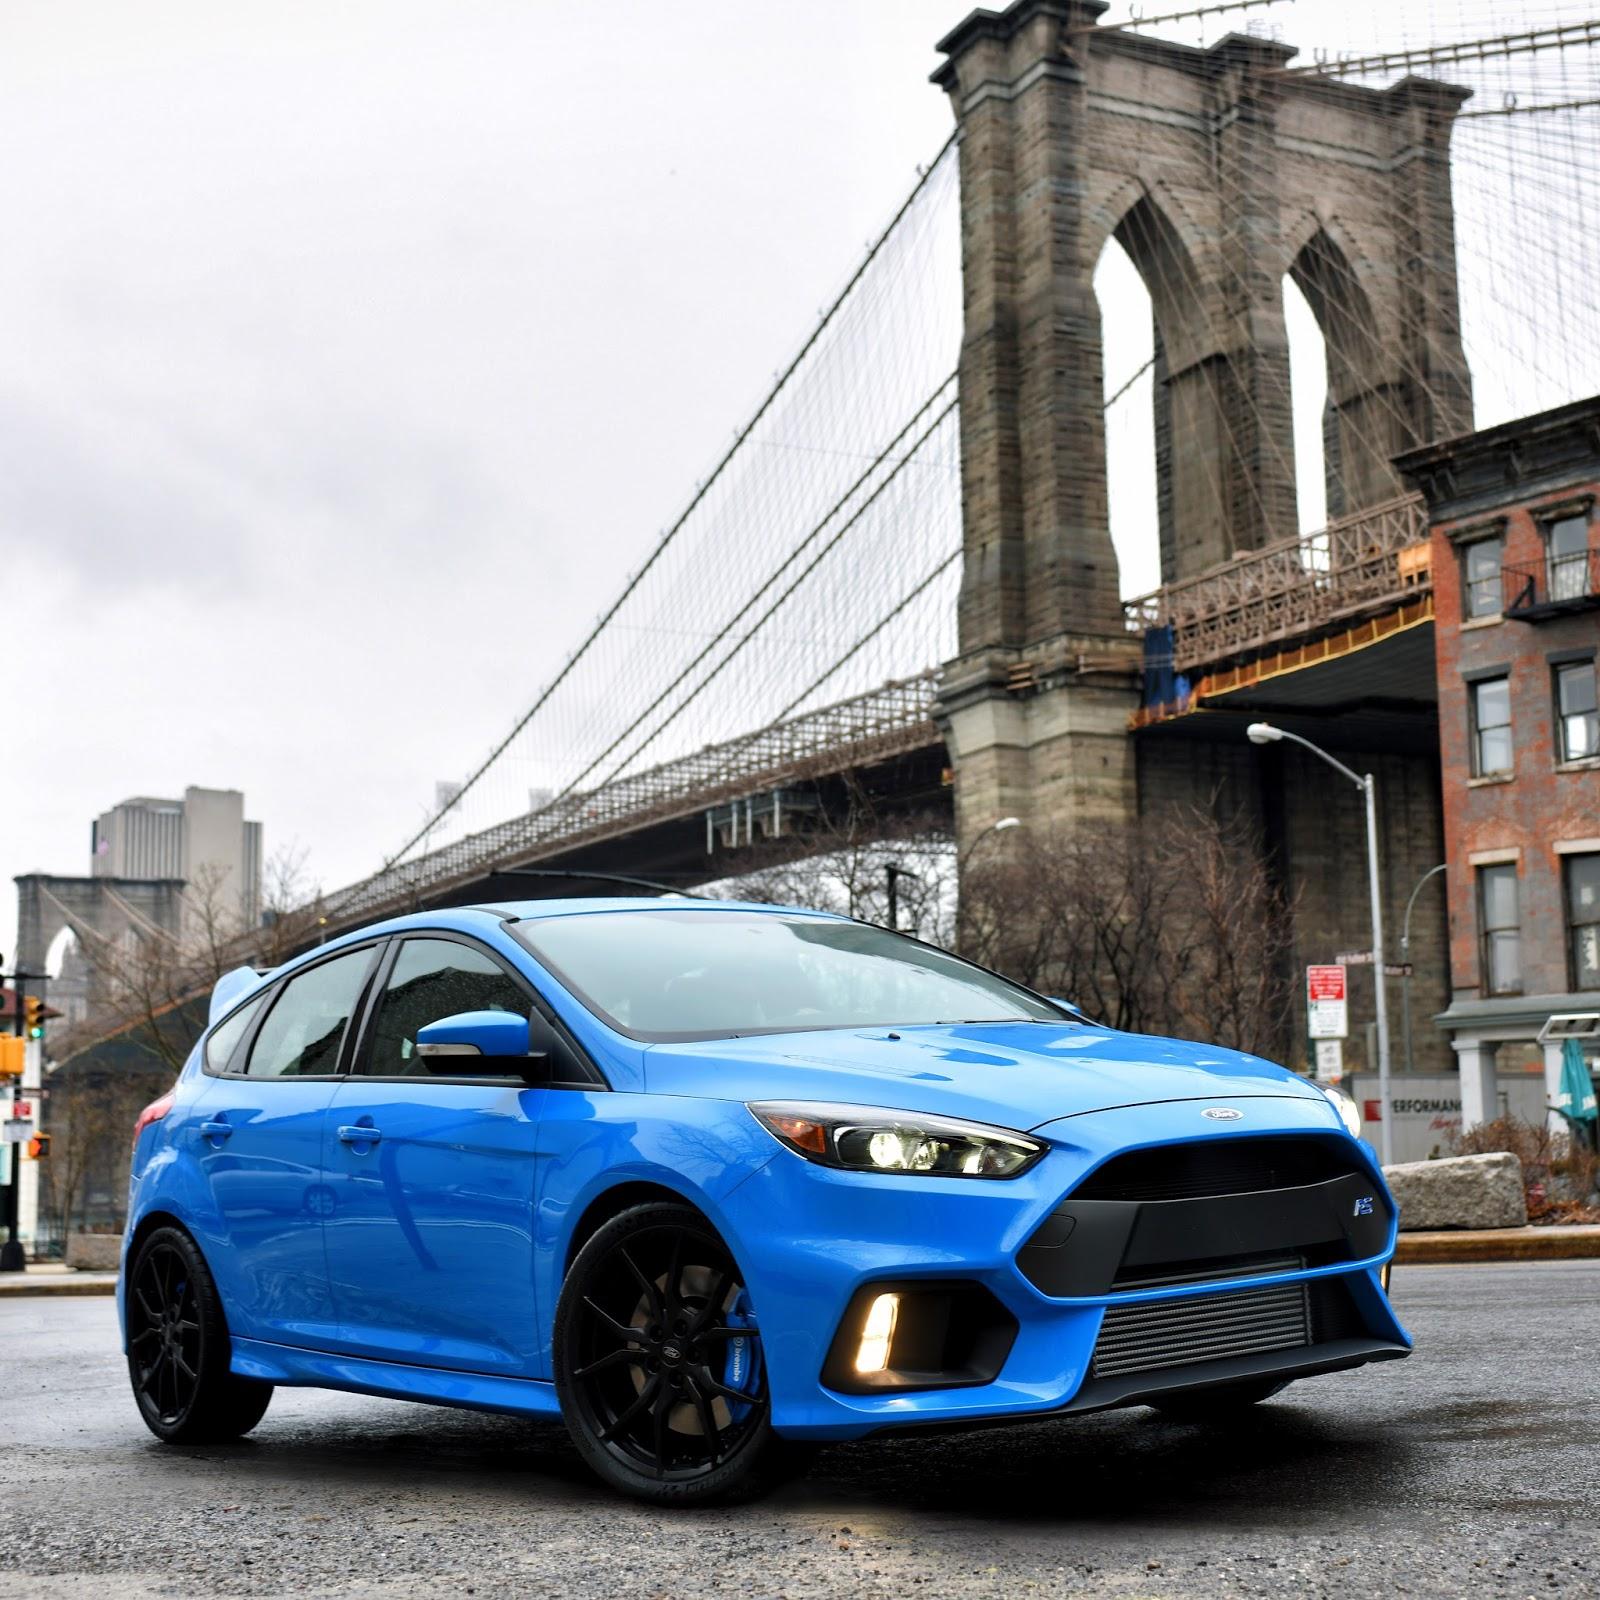 FocusRS Δες το τετρακίνητο Ford Focus RS και την νέα Mustang παρέα με όλα τα Ford στην έκθεση αυτοκινήτου 2015